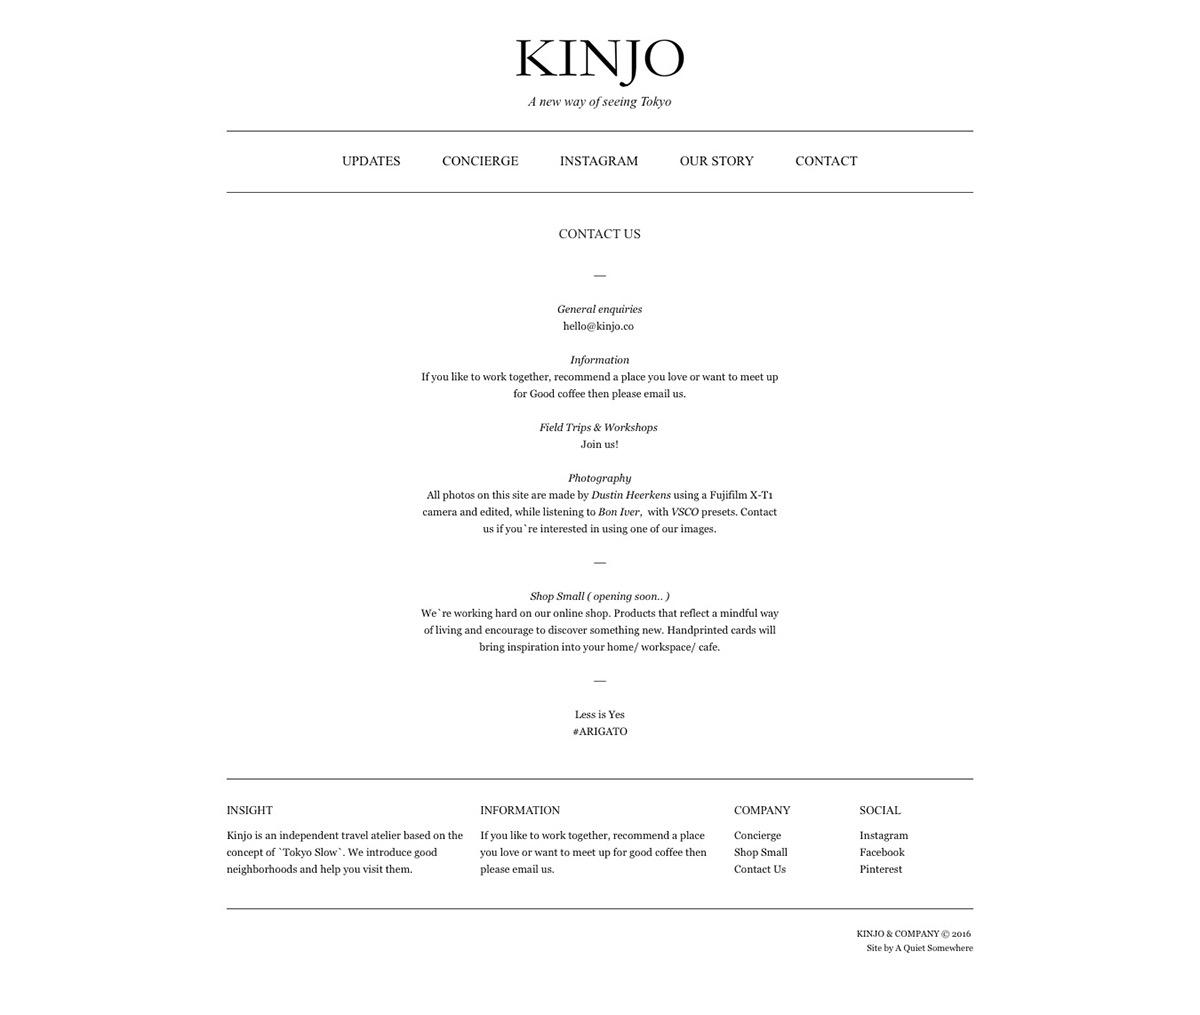 Squarespace 7 Website KINJO tour guide japan tokyo design The Printer's Son